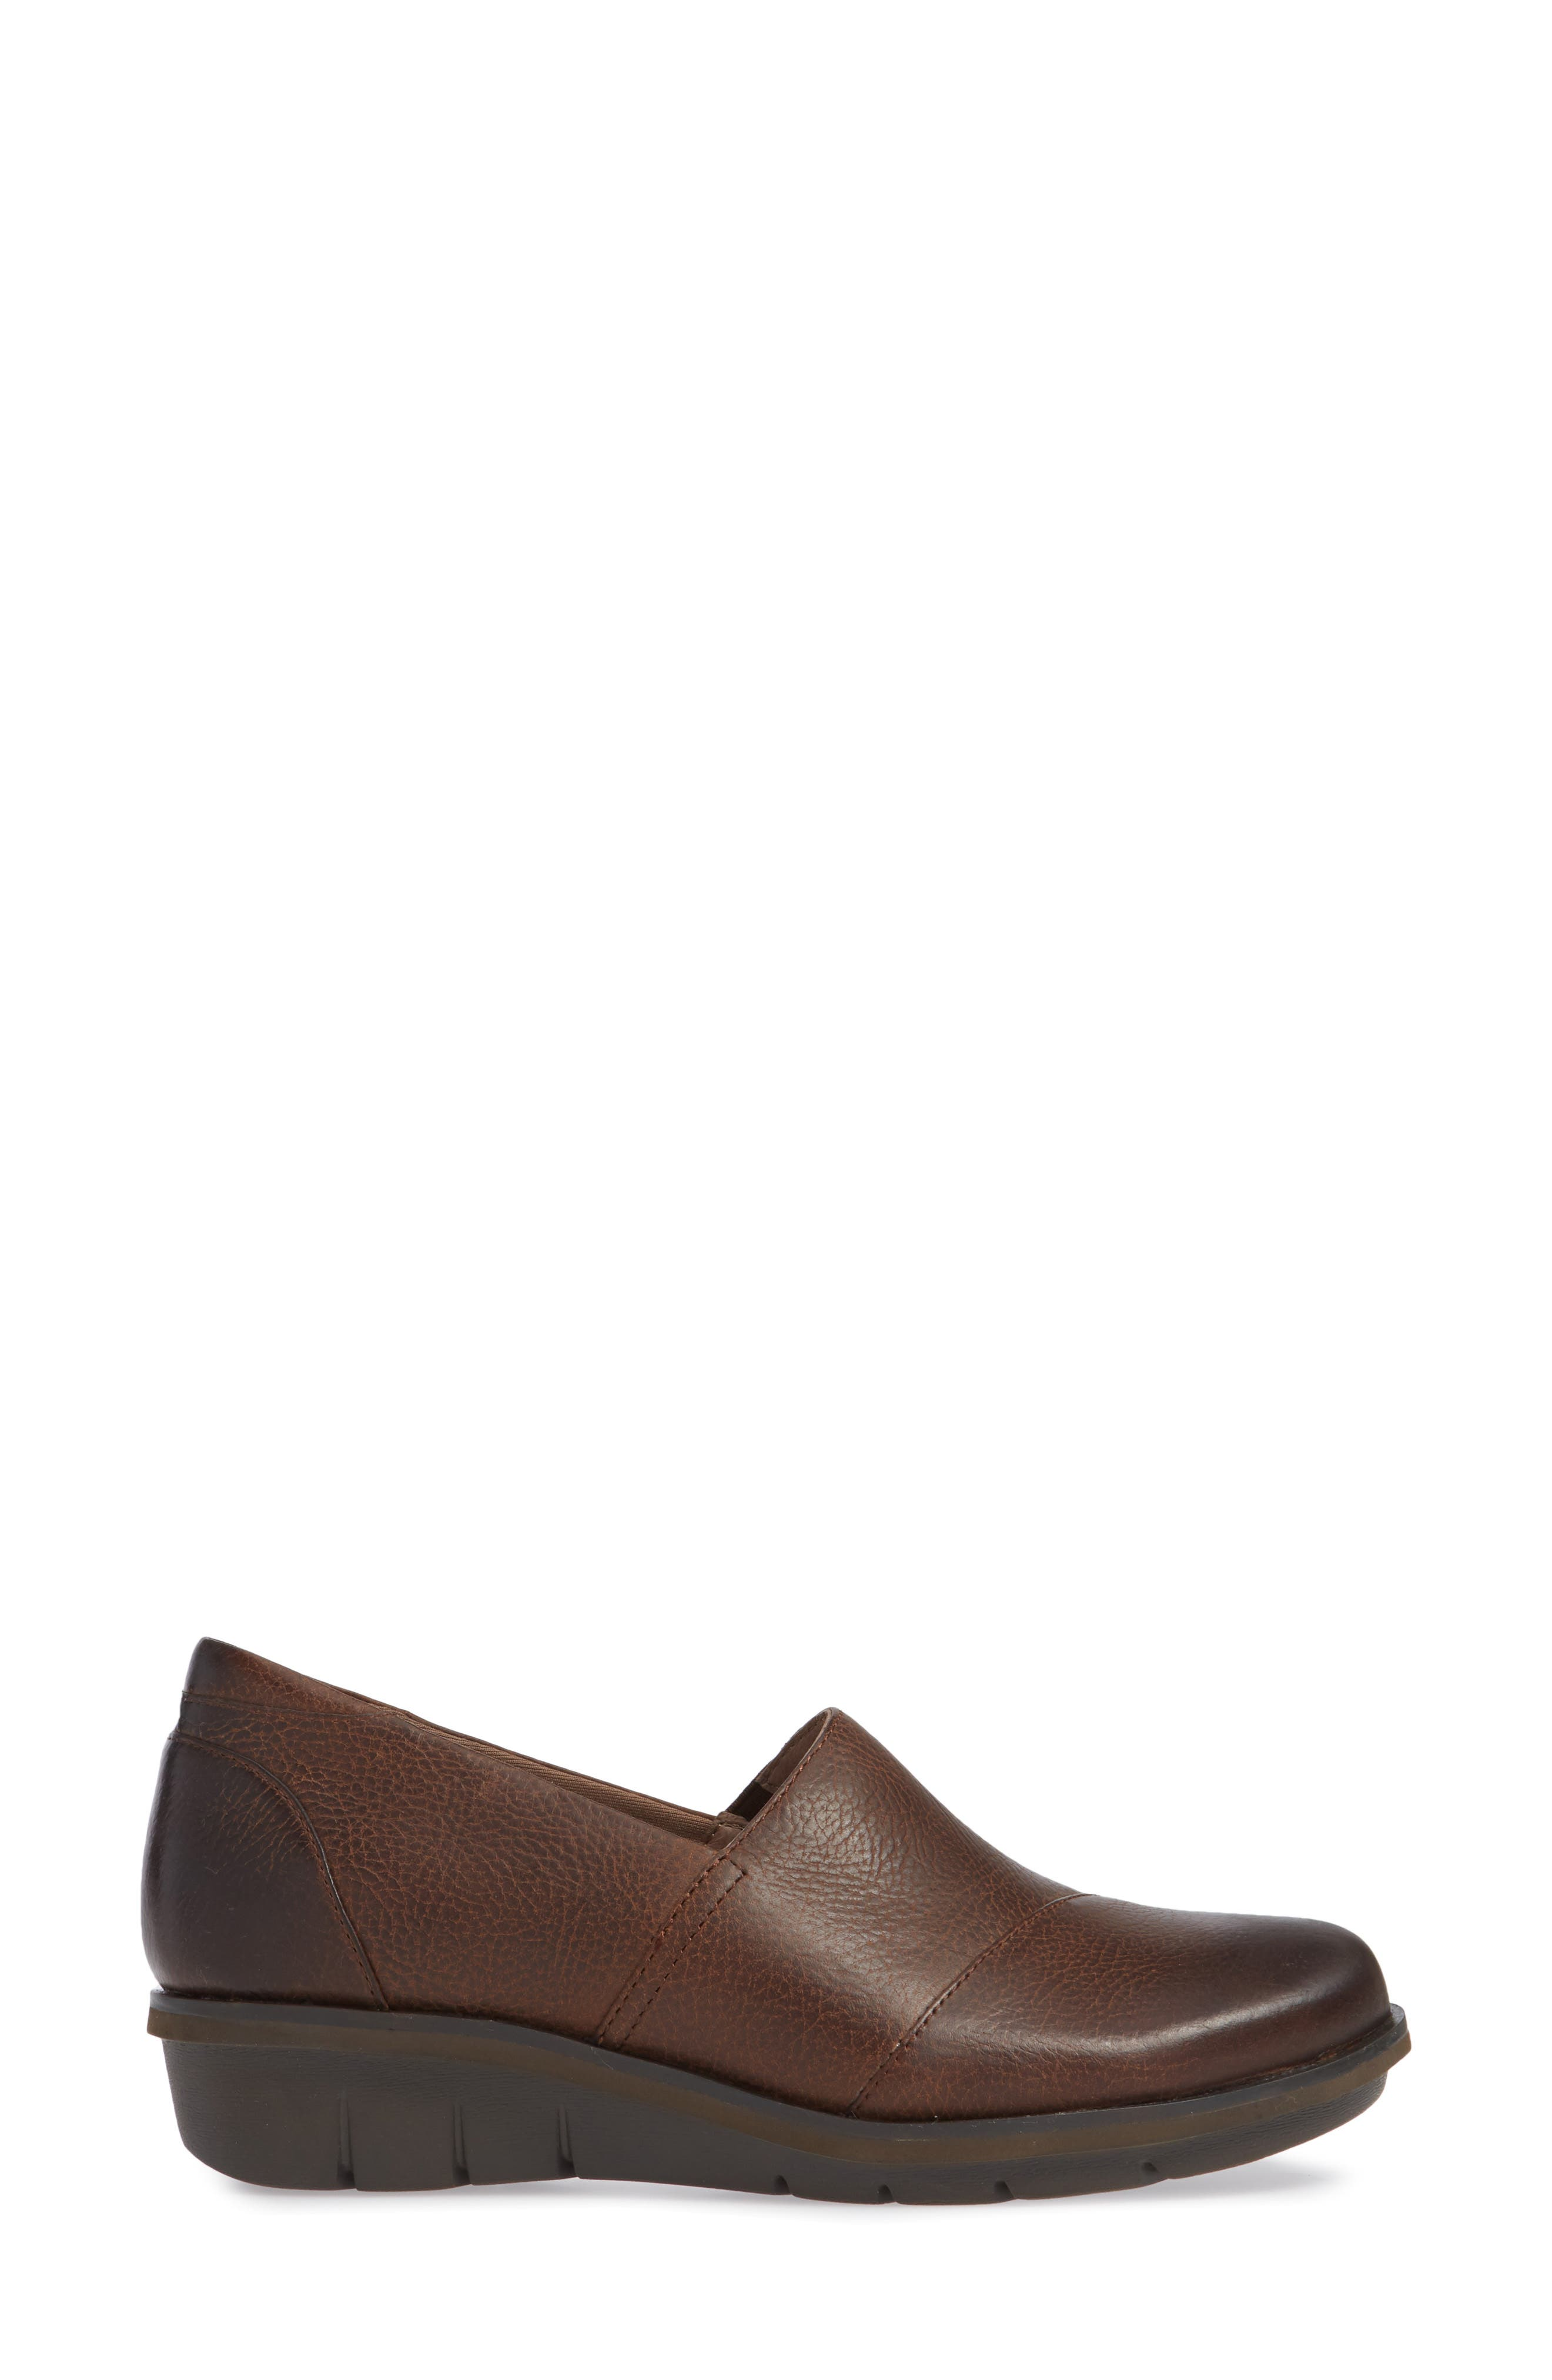 Dankso Julia Wedge Slip-On,                             Alternate thumbnail 4, color,                             Brown Burnished Nubuck Leather